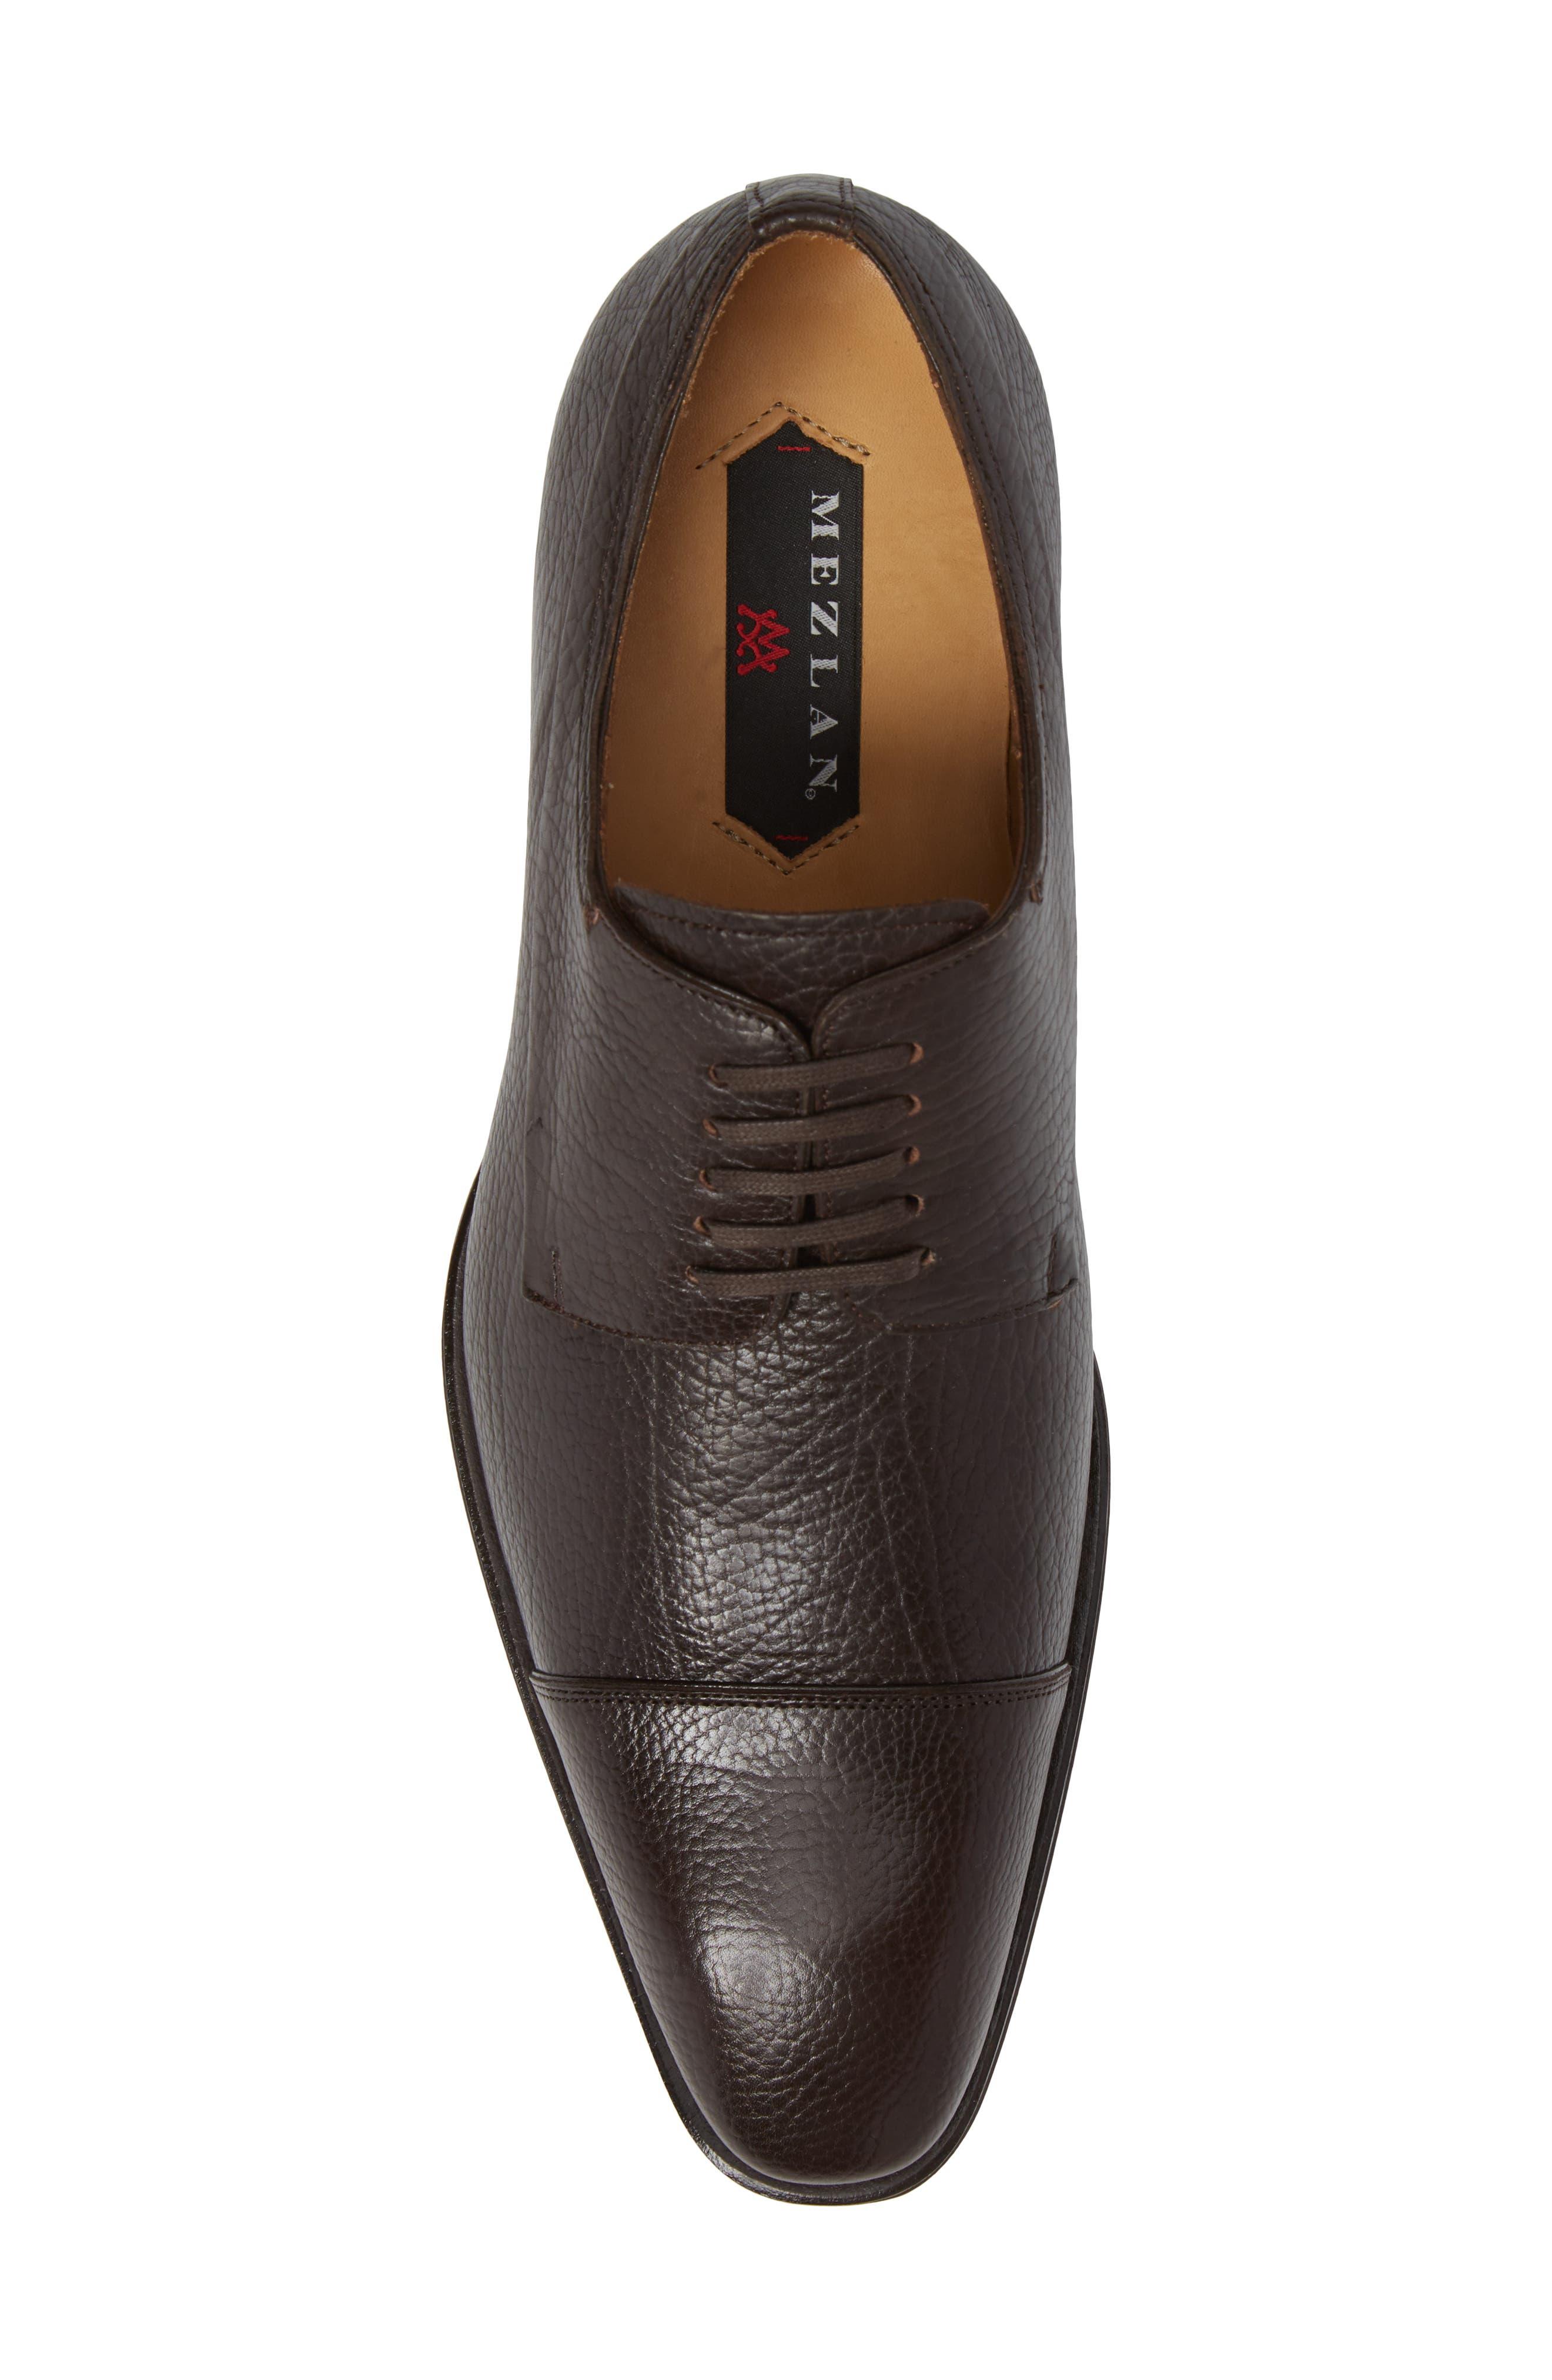 Pulpi Cap Toe Derby,                             Alternate thumbnail 5, color,                             Brown Leather